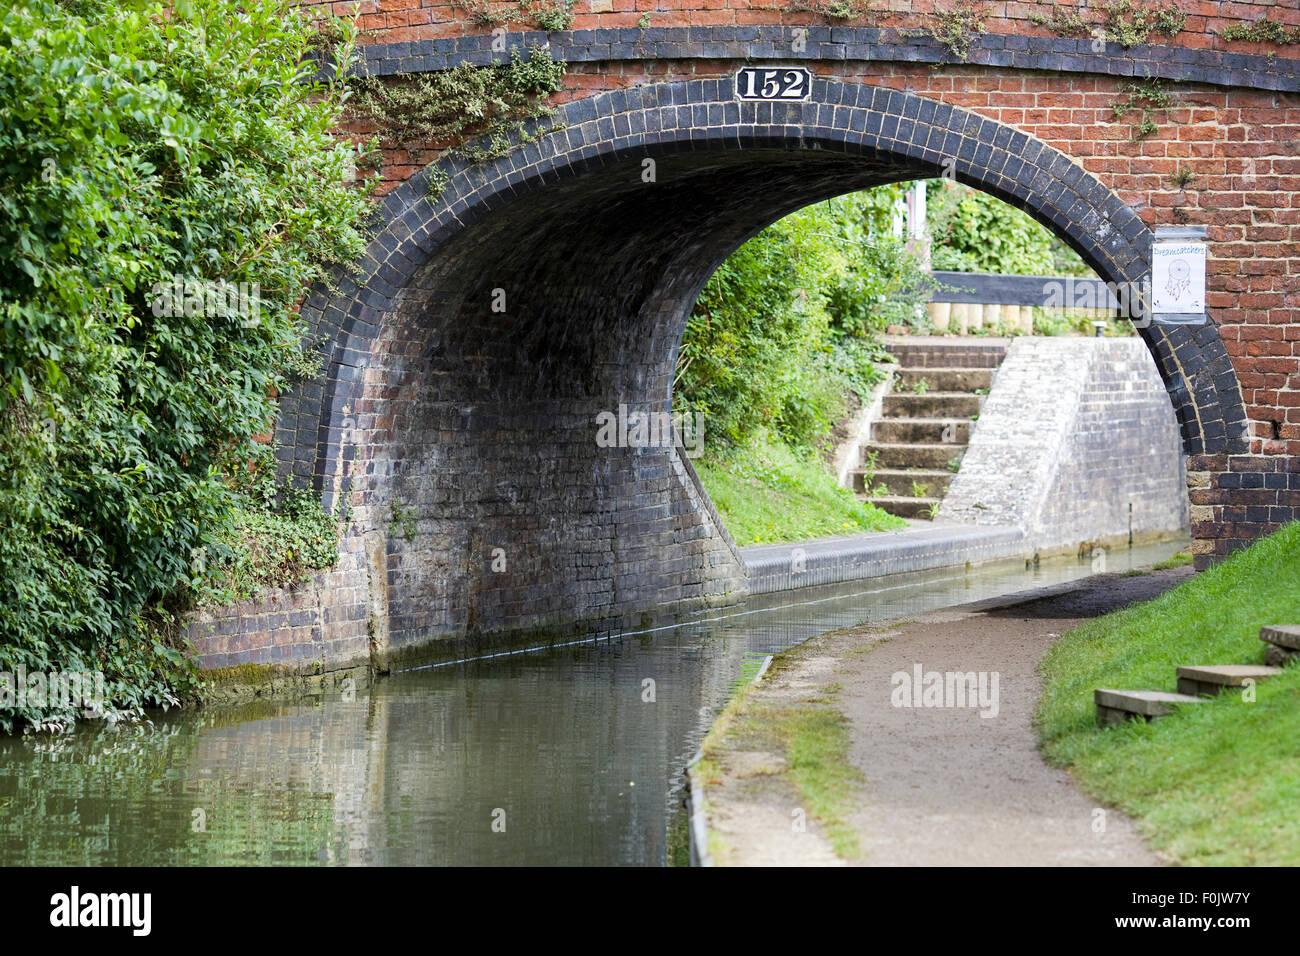 Cropredy Lock Bridge No 152 - Stock Image